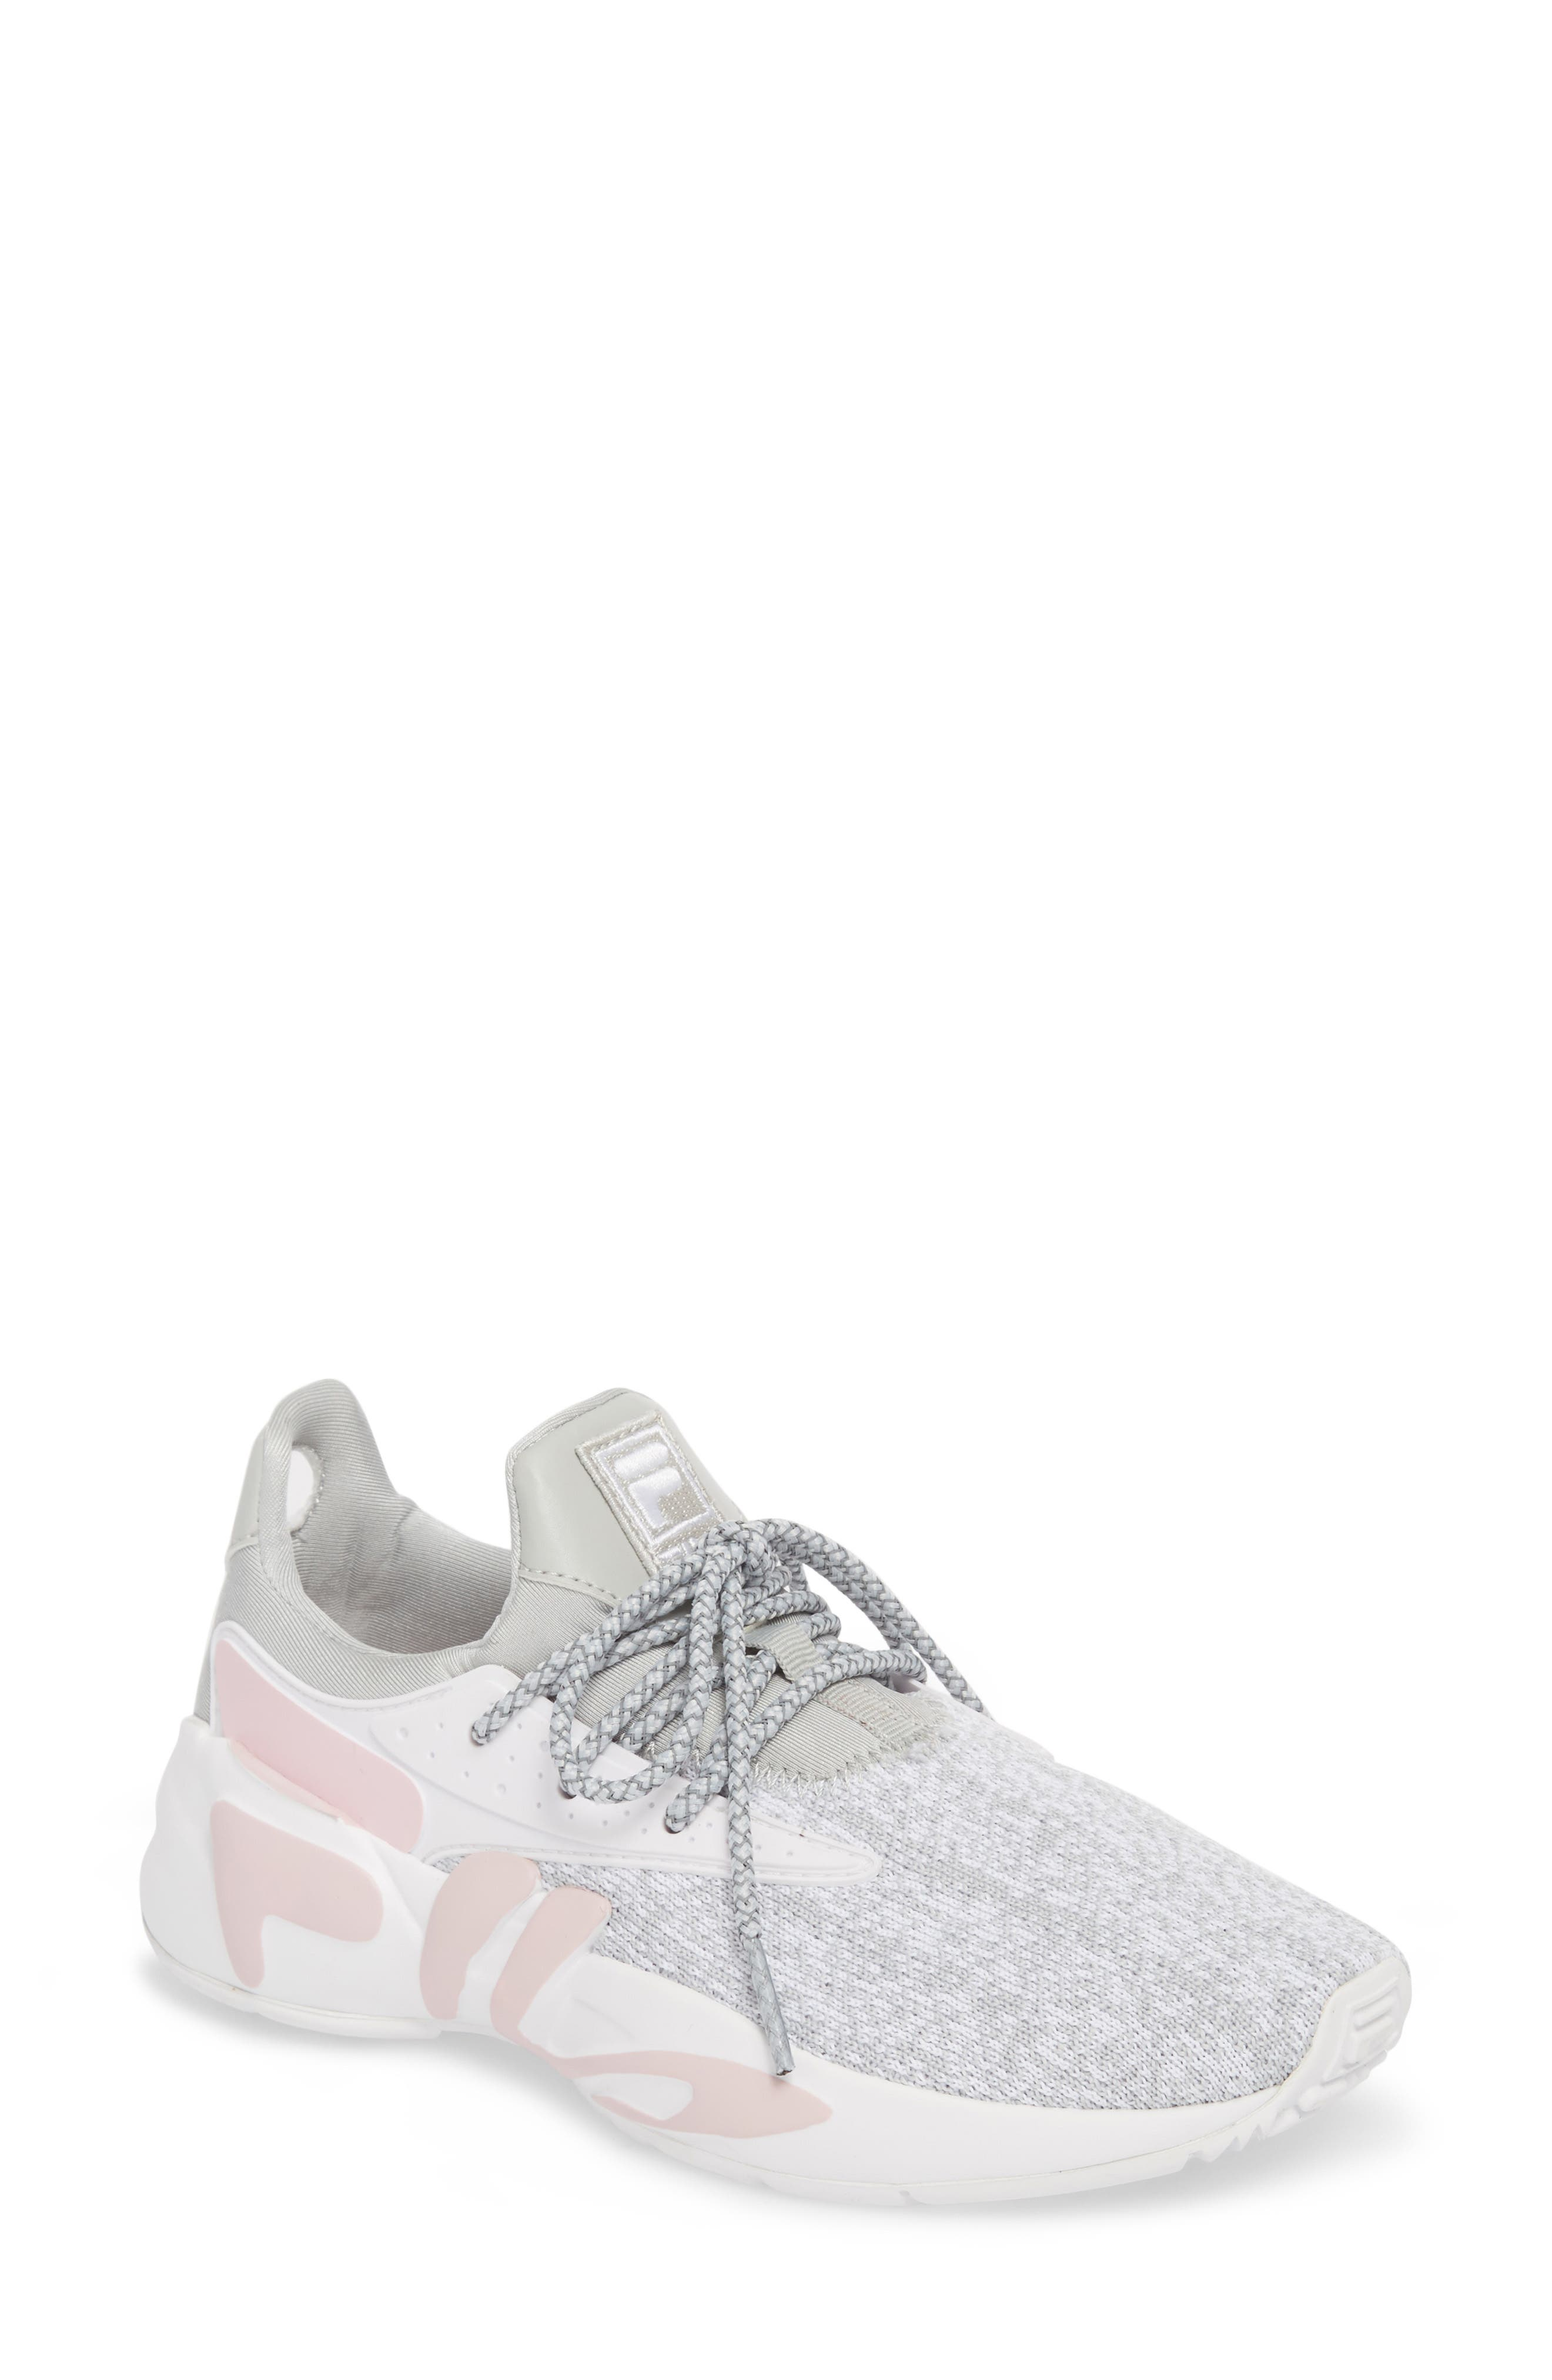 Mindbreaker 2.0 Sneaker,                         Main,                         color, 070